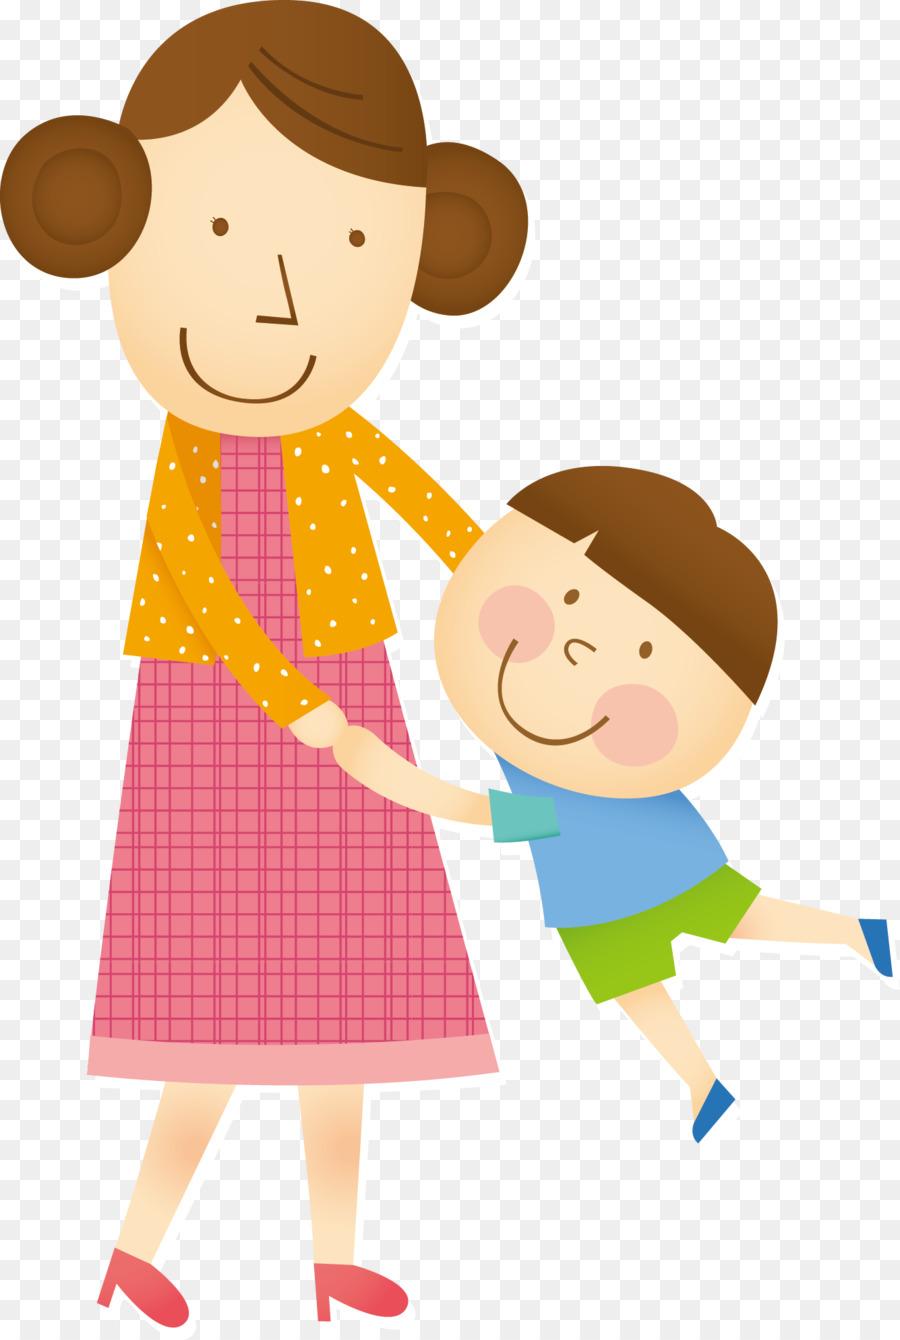 Animasi Ibu Dan Anak : animasi, Download, 1335*1987, Transparent, Child, Download., CleanPNG, KissPNG